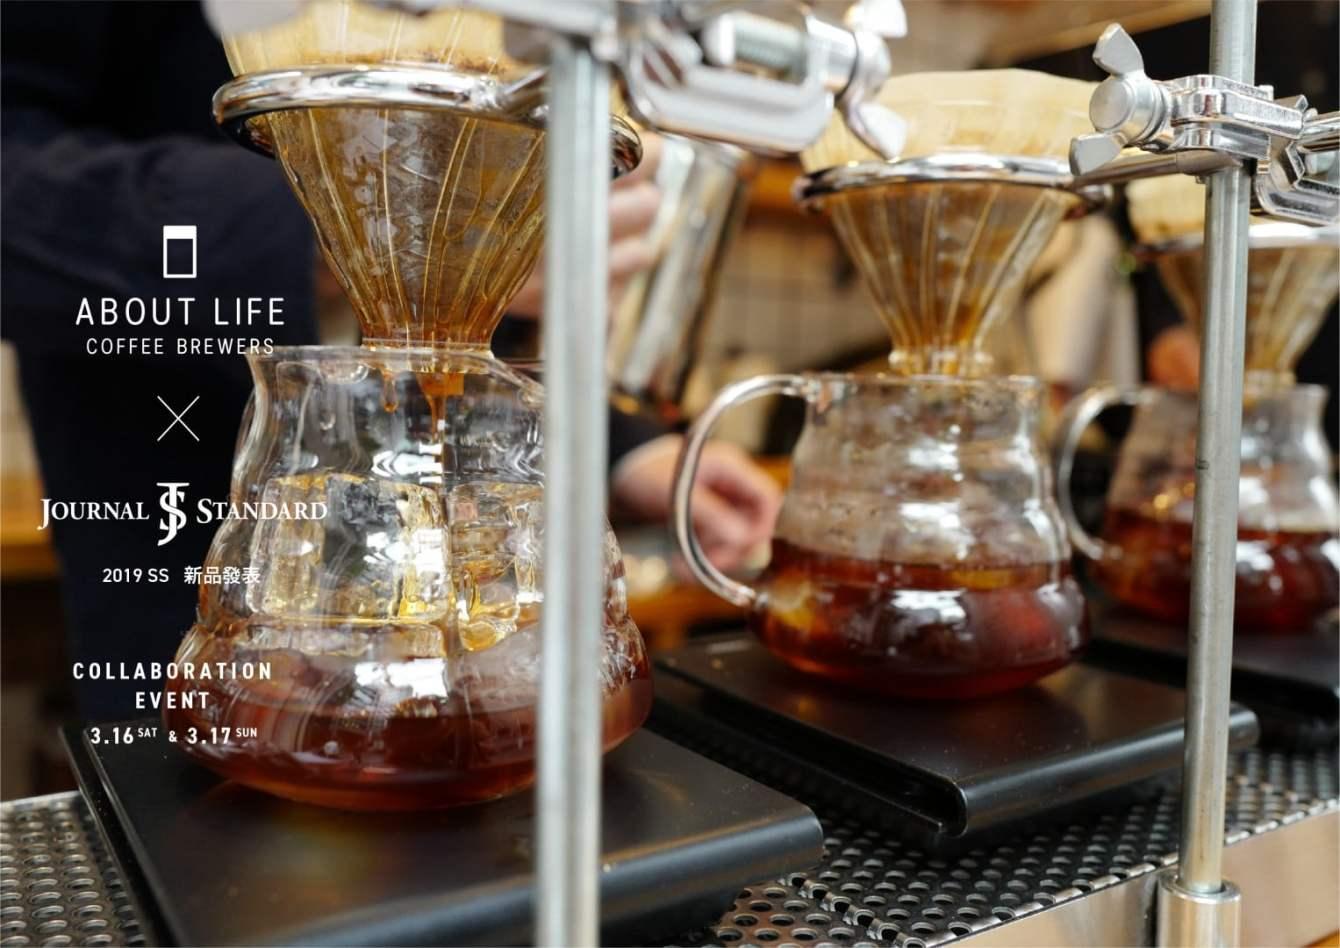 # JOURNAL STANDARD 19SS 新品發表:結合人氣咖啡 ABOUT LIFE COFFEE BREWERS 推出聯名 1